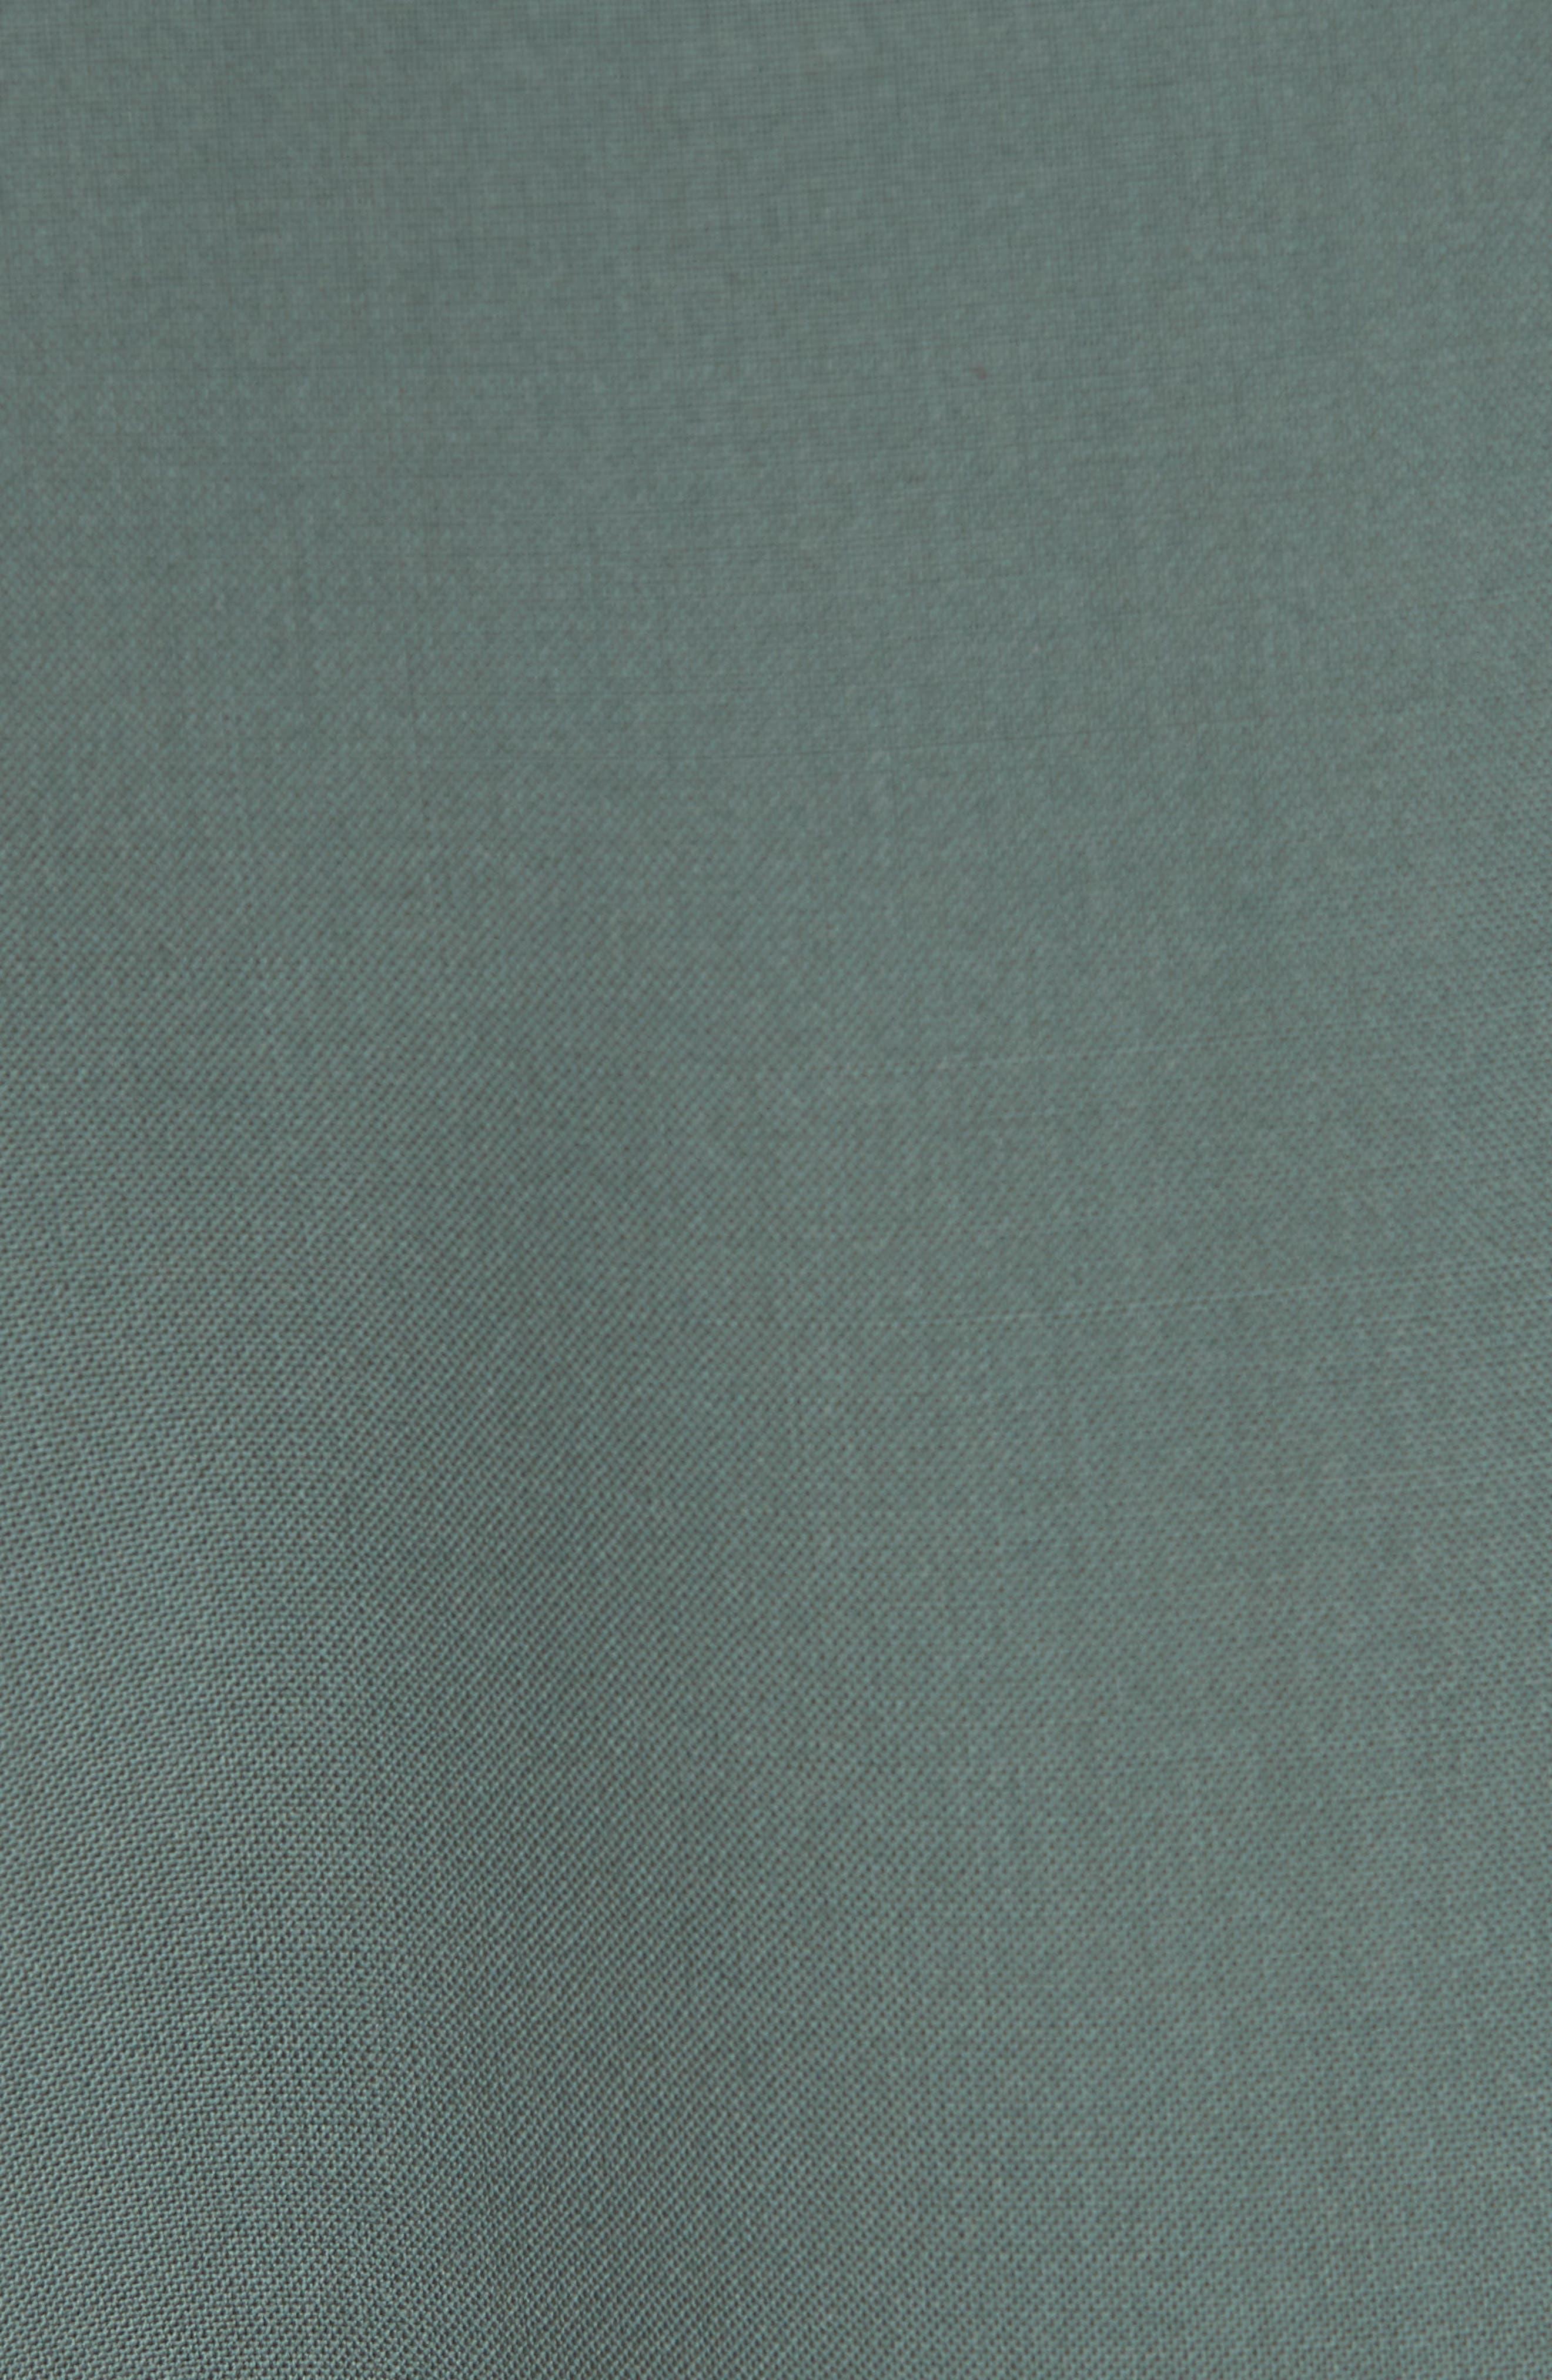 Etienette B Good Wool Suit Jacket,                             Alternate thumbnail 41, color,